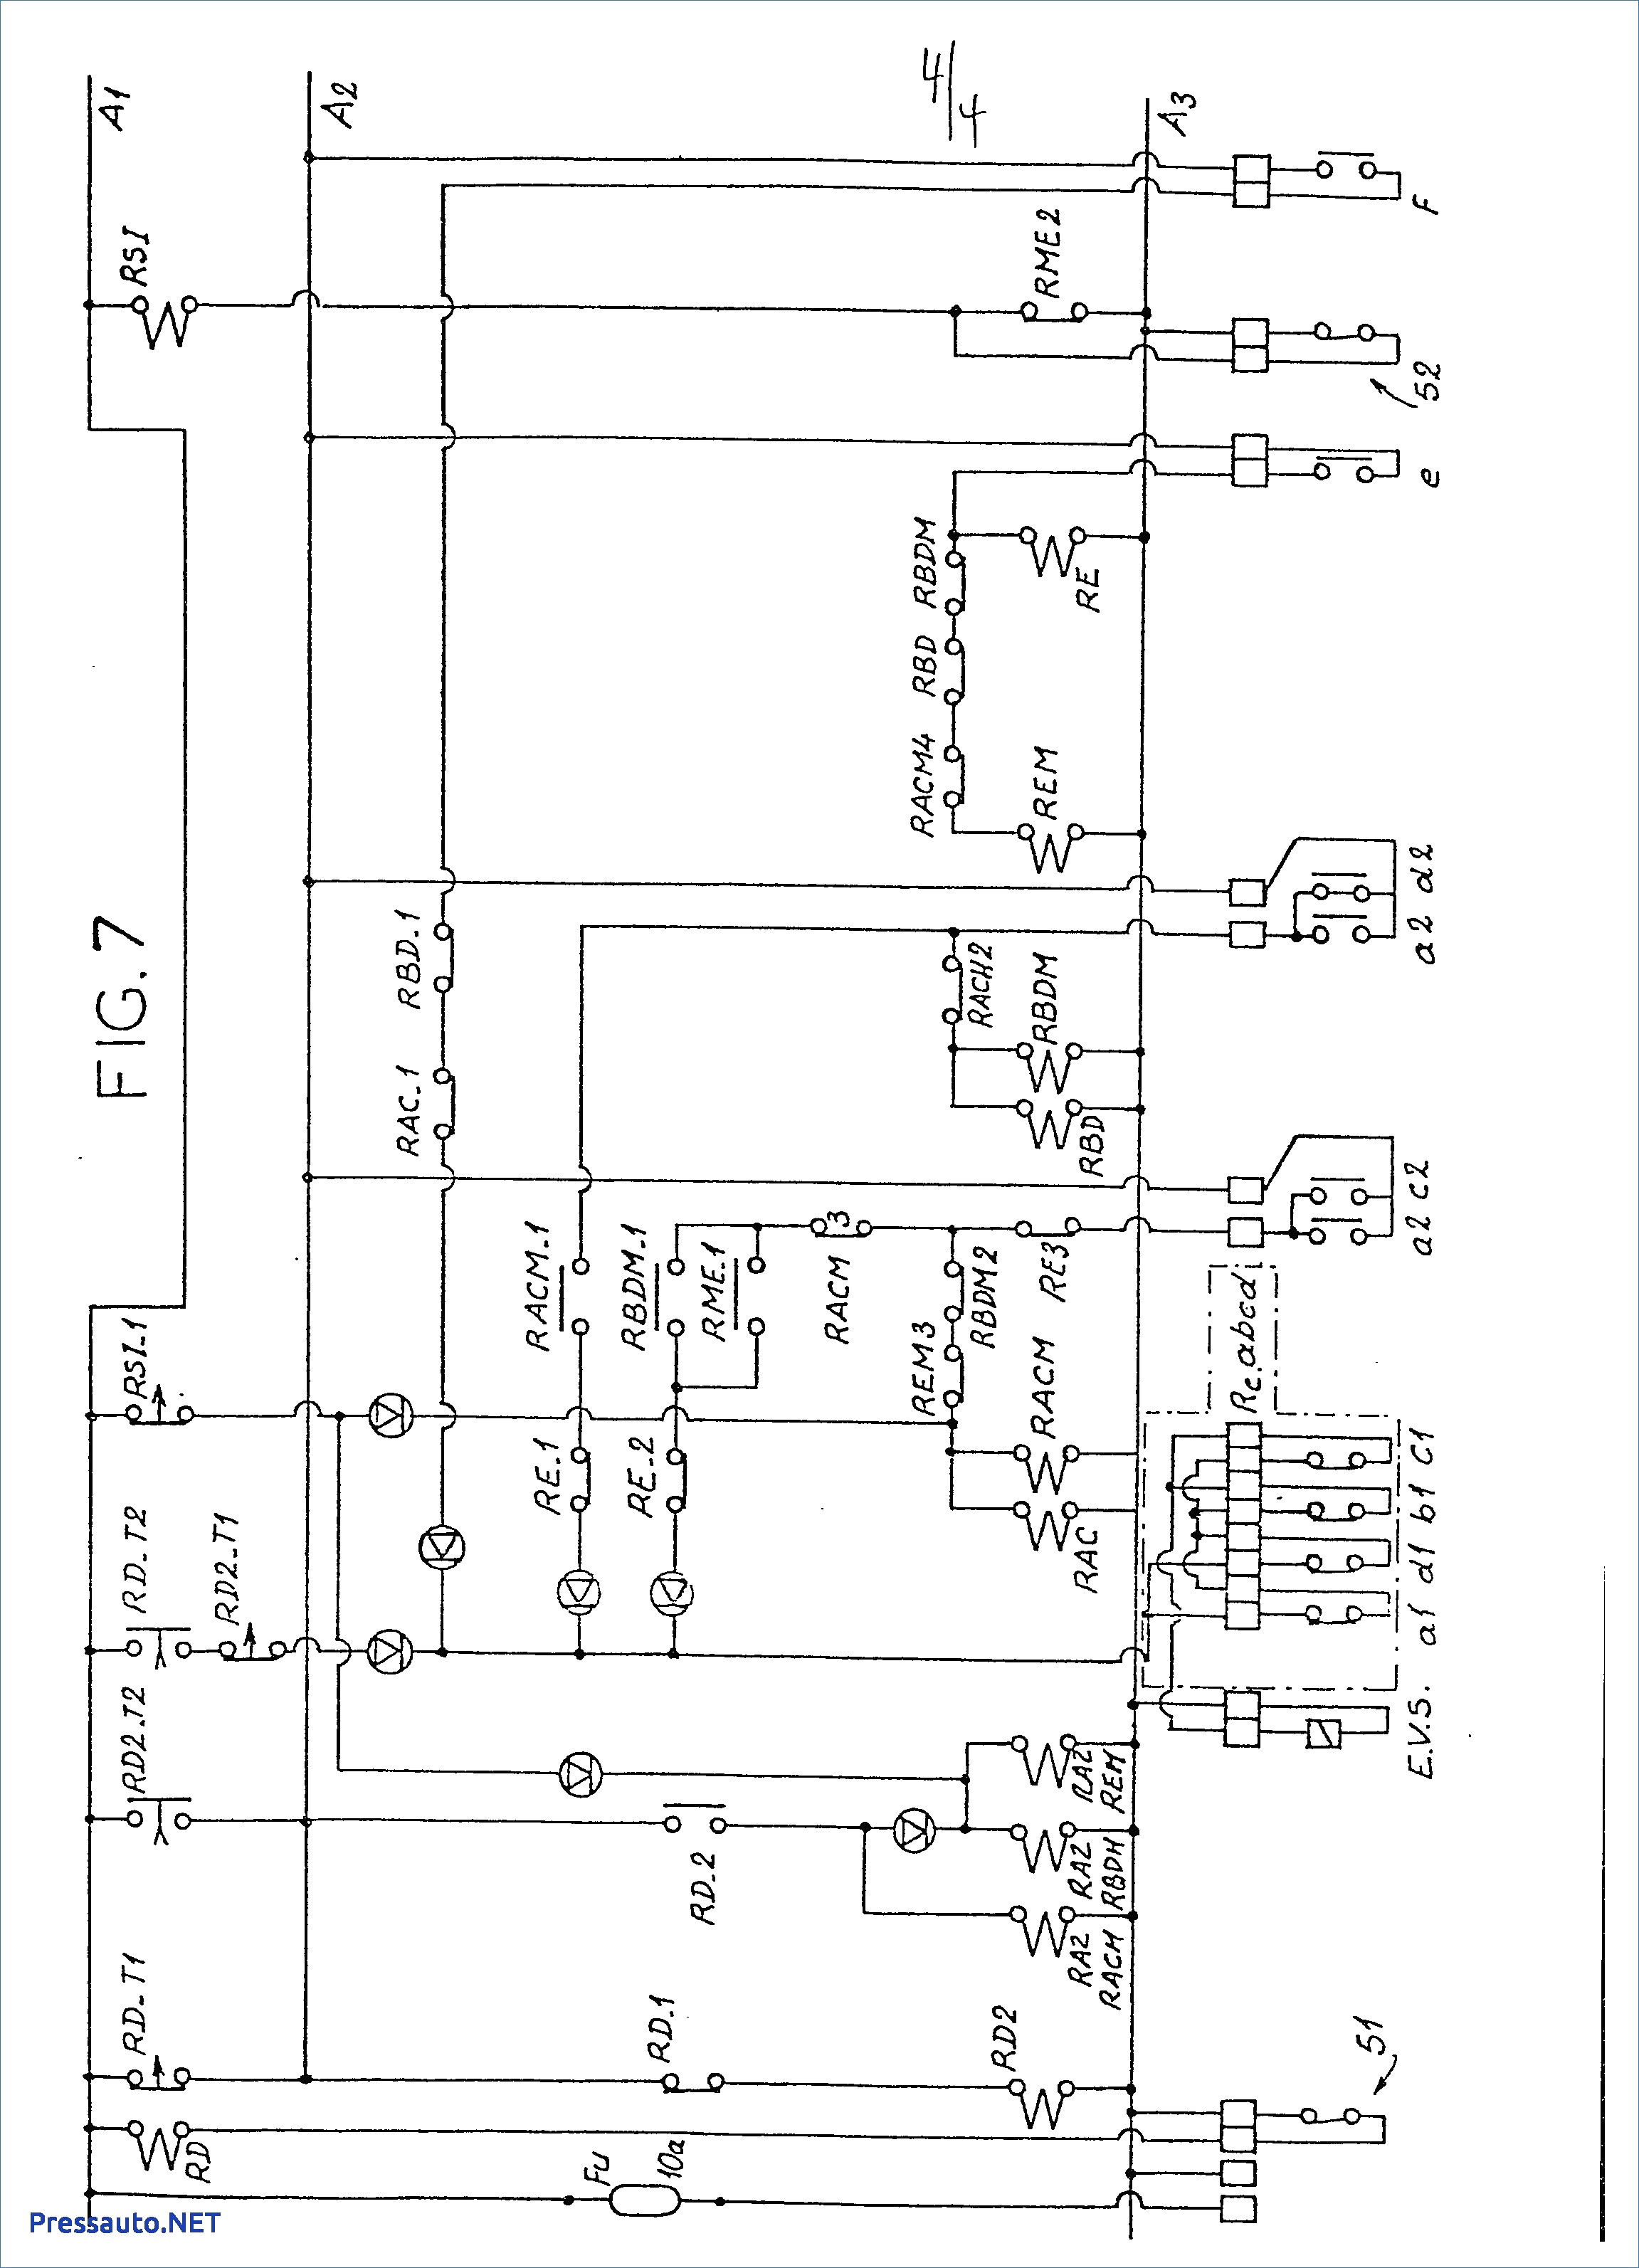 [TBQL_4184]  RV_9332] Solenoid Valve Wiring Diagram On Demag Hoist Wiring Diagram For Crane  Wiring Diagram | Demag Hoist Wiring Diagram |  | Chim Penghe Exxlu Skat Estep Ophag Drosi Elia Xero Alypt Trua Sand Awni  Eopsy Peted Oidei Vira Mohammedshrine Librar Wiring 101